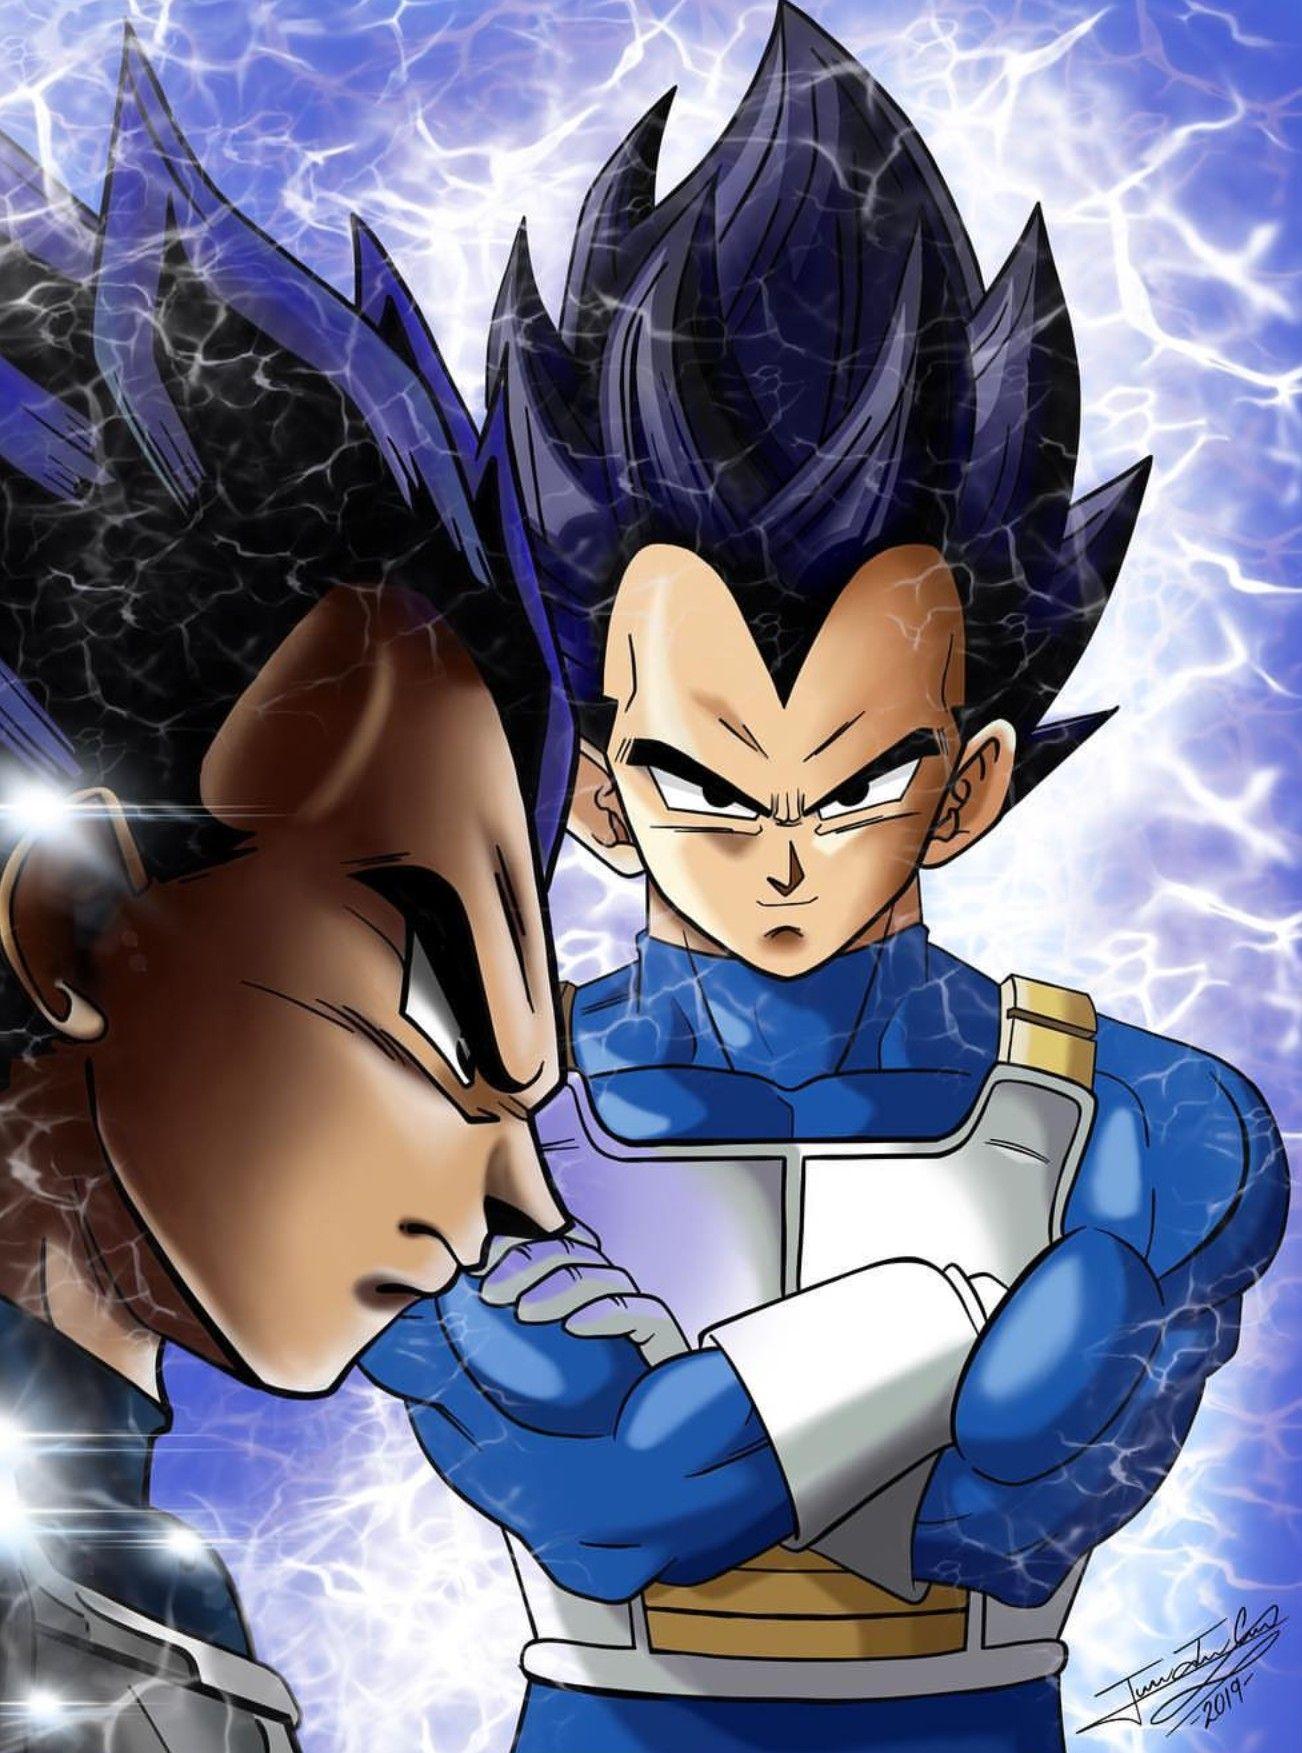 Dragon Ball Z Hashtags: Dragon Ball Z, Dragon Ball Gt